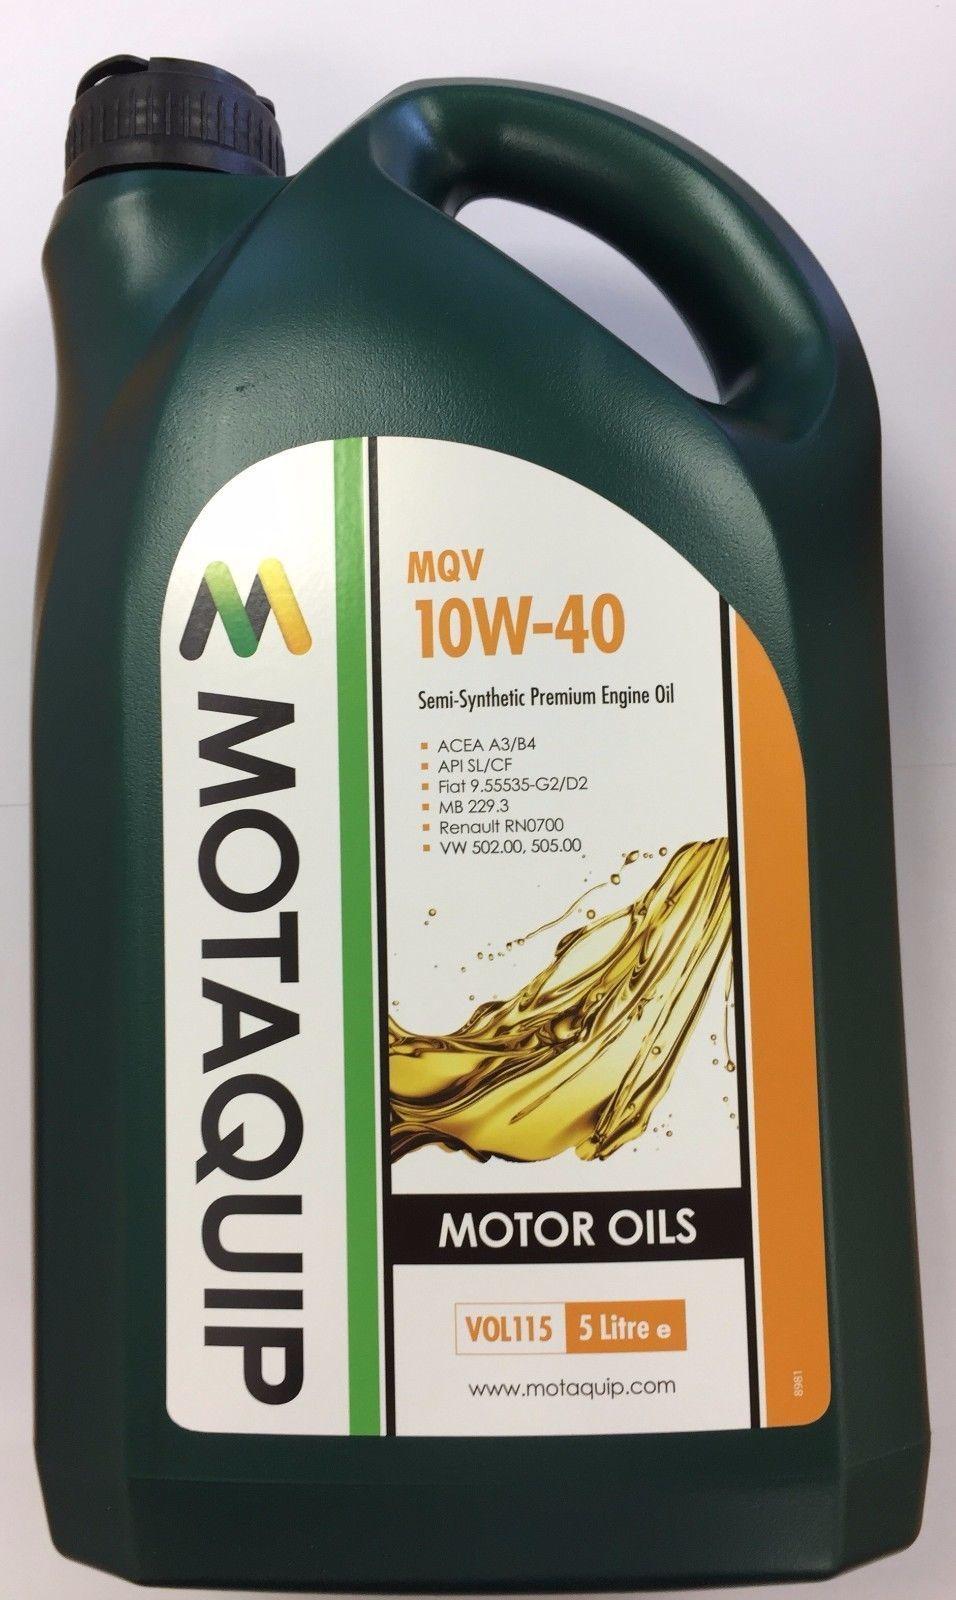 Motaquip 10w40 Semi synthetic engine oil - £11.45 @ eBay / car_part_supermarket*